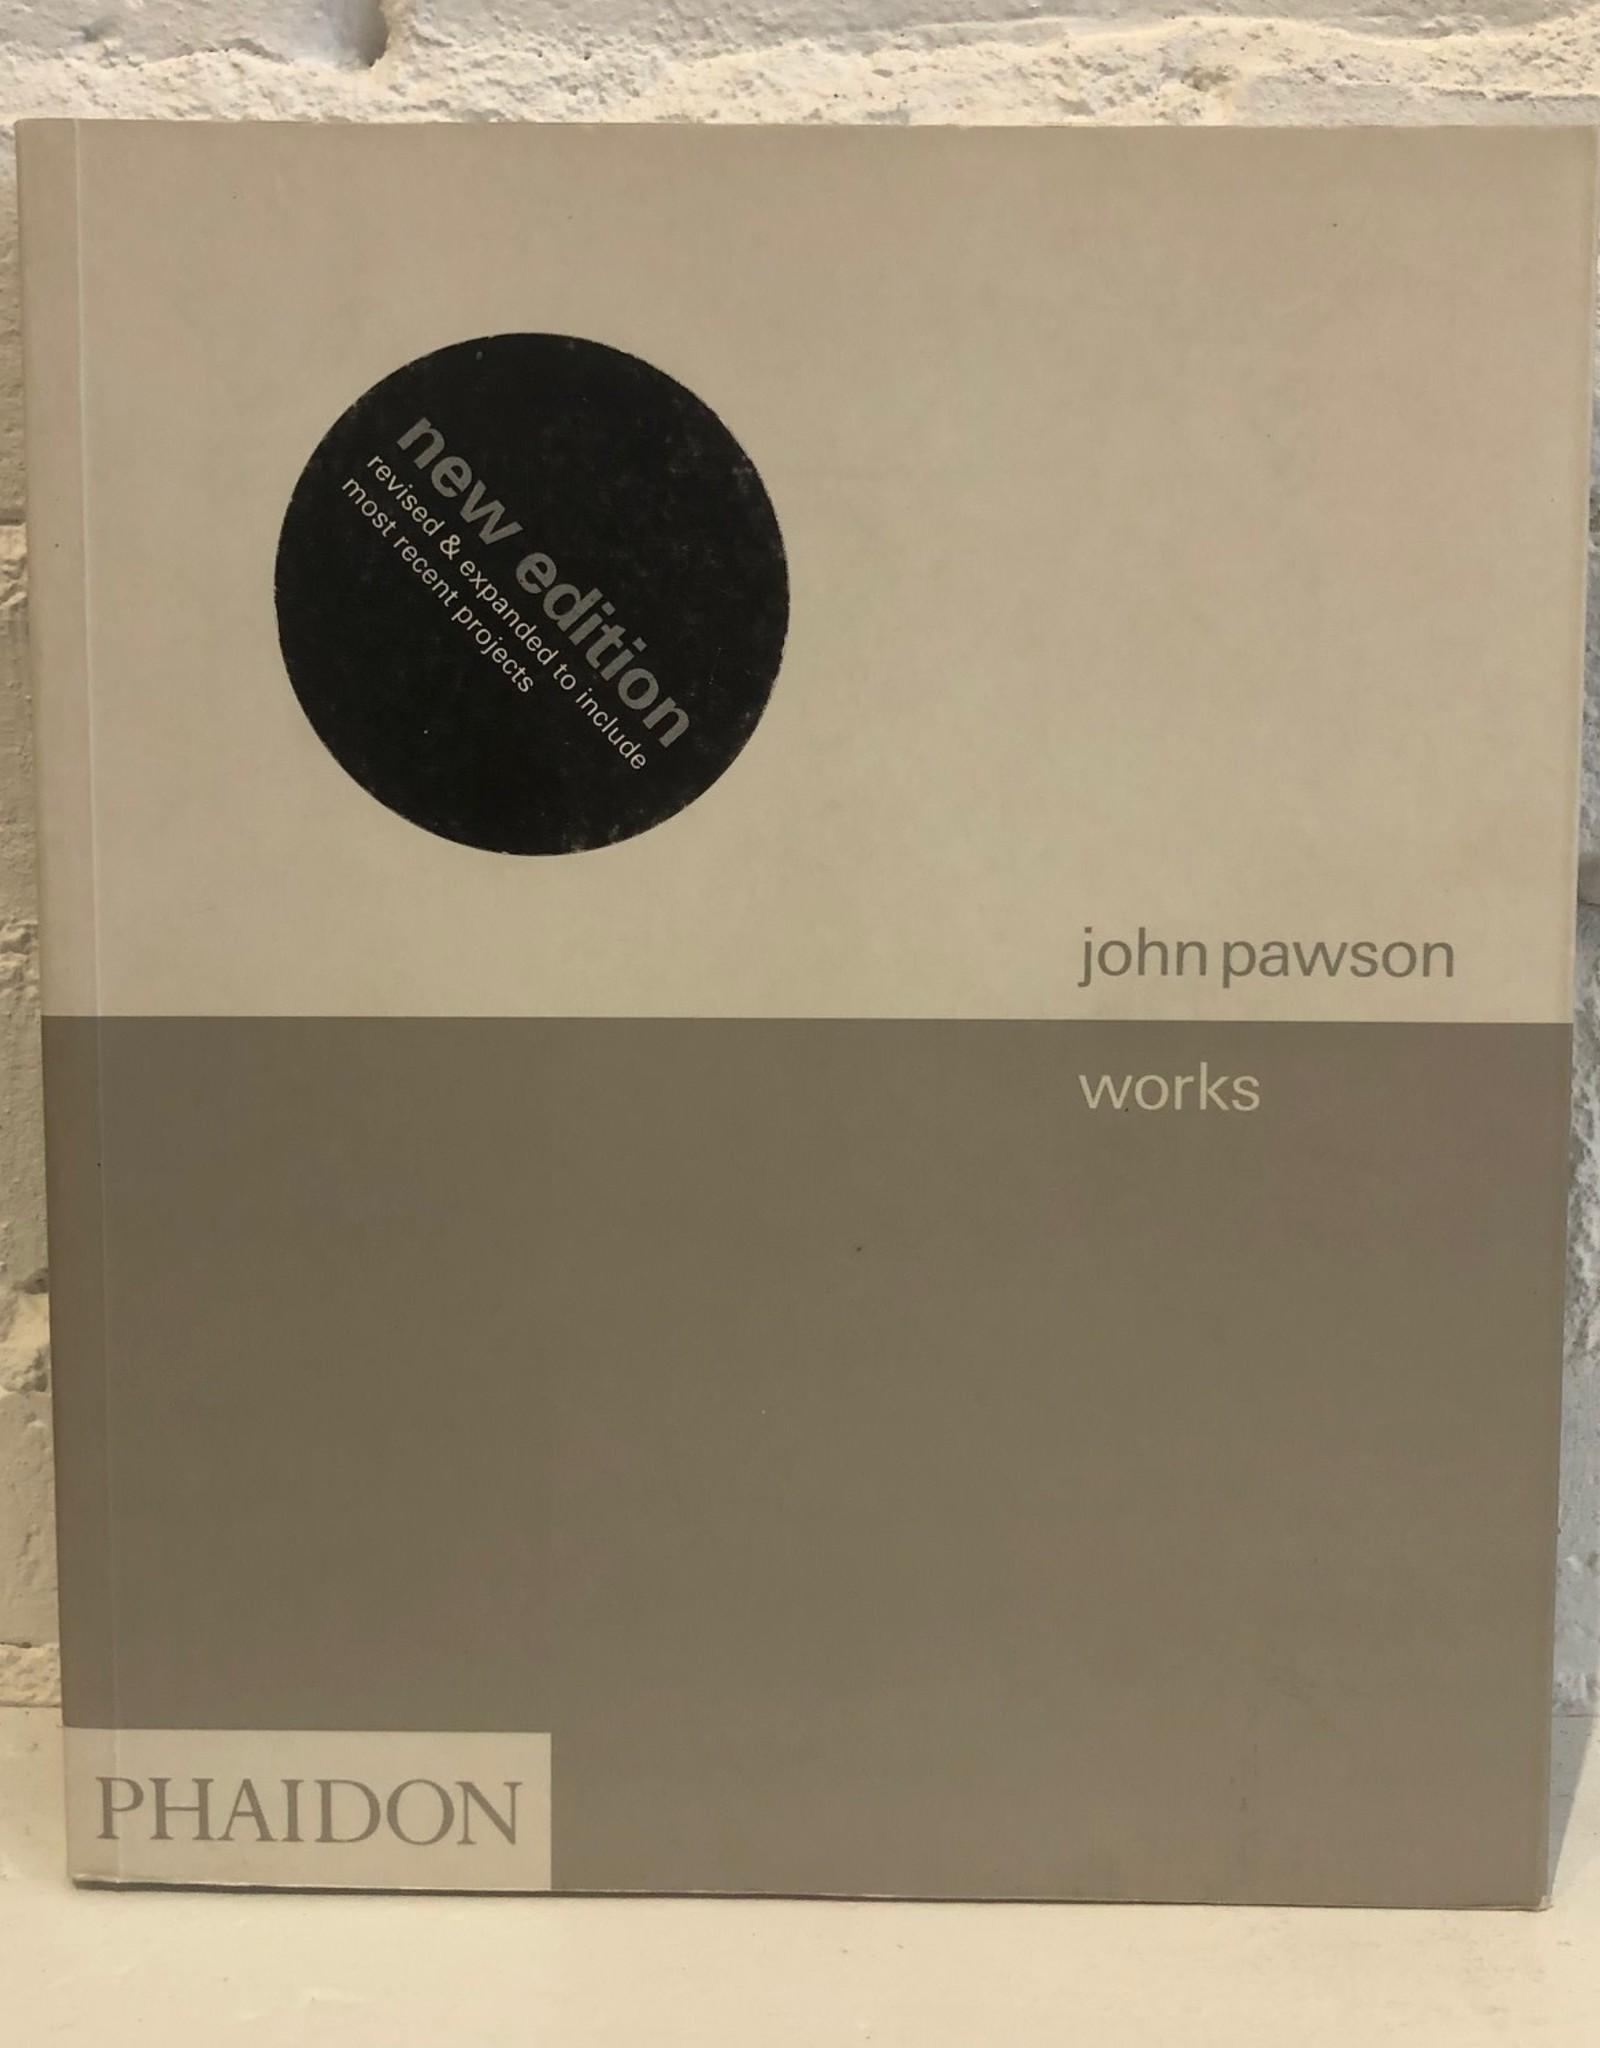 John Pawson: Works